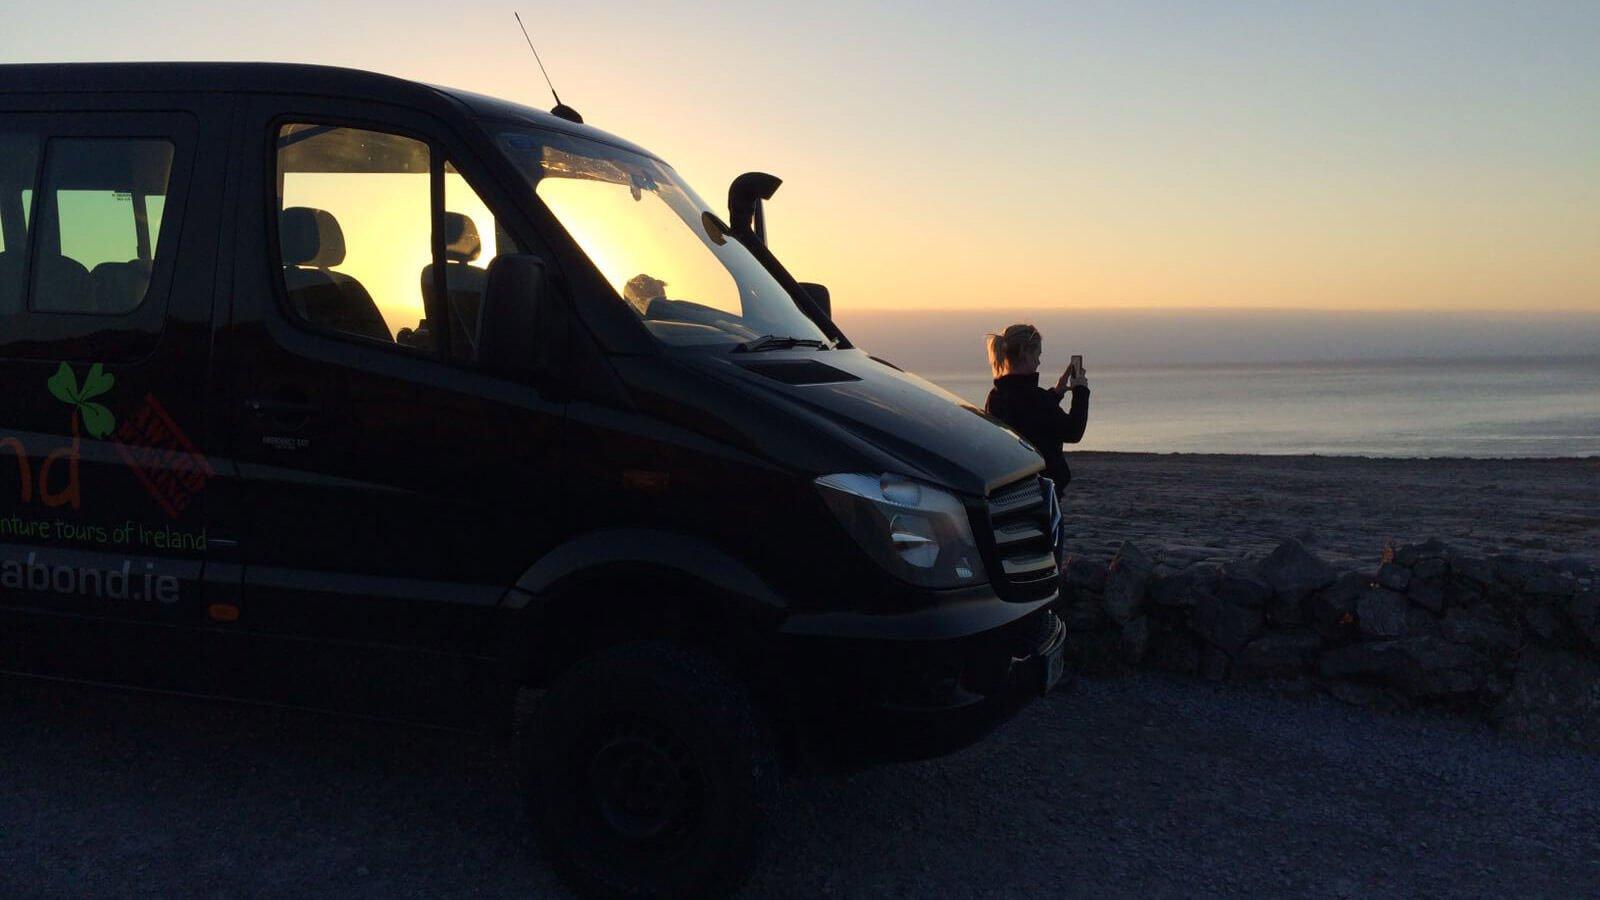 Vagatron tour vehicle with Vagabond tour guide, silhouette by the sun